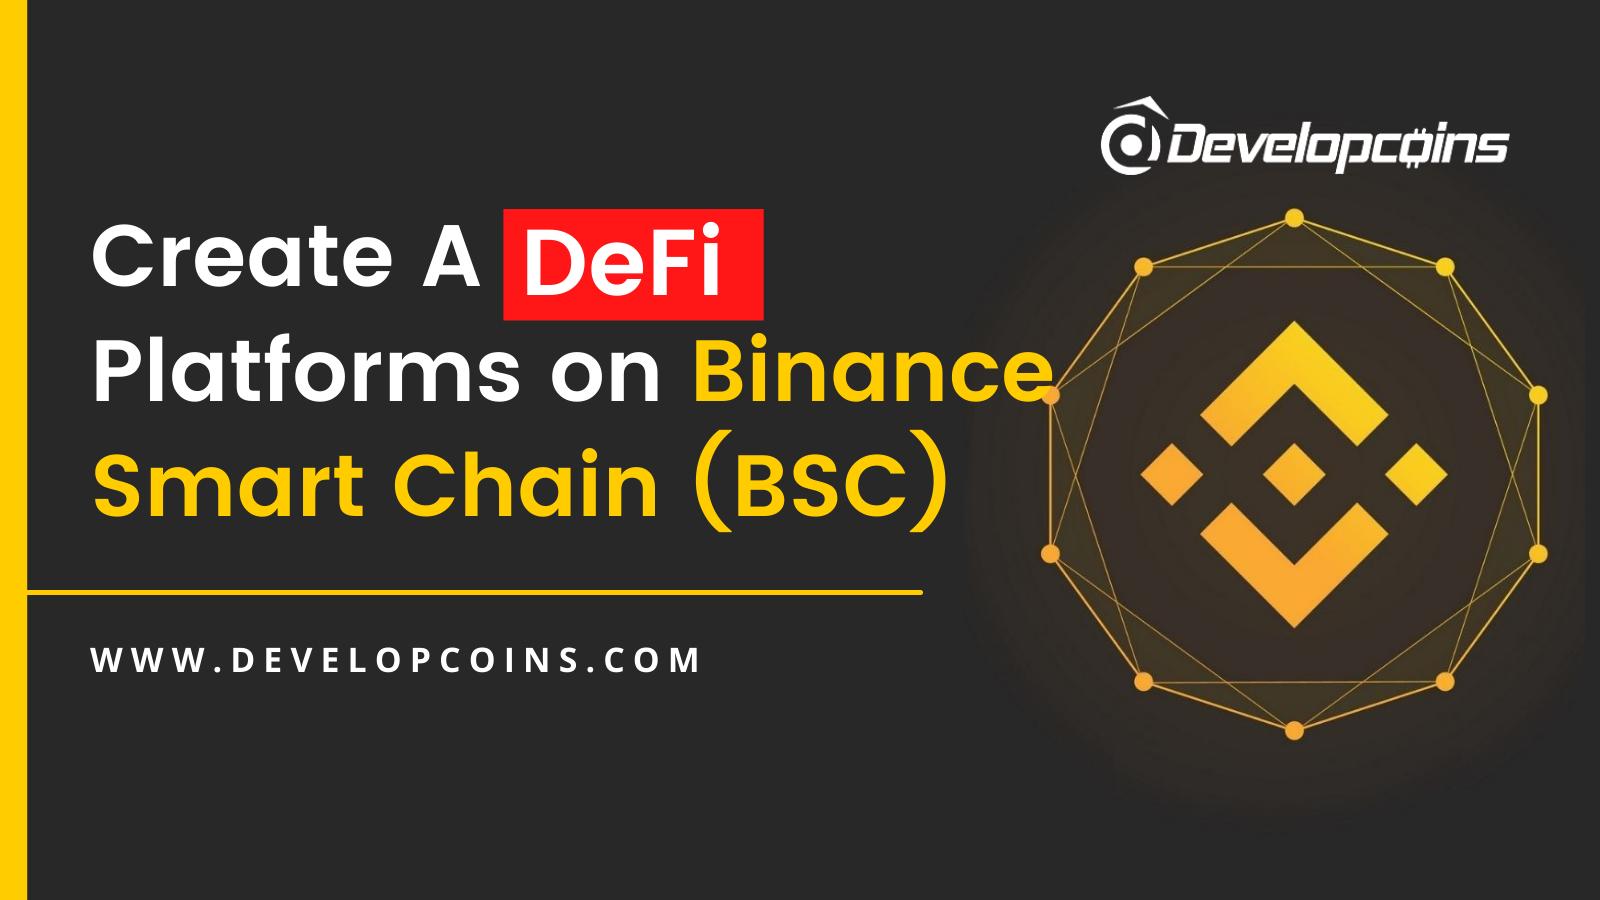 Create DeFi Platforms on Binance Smart Chain